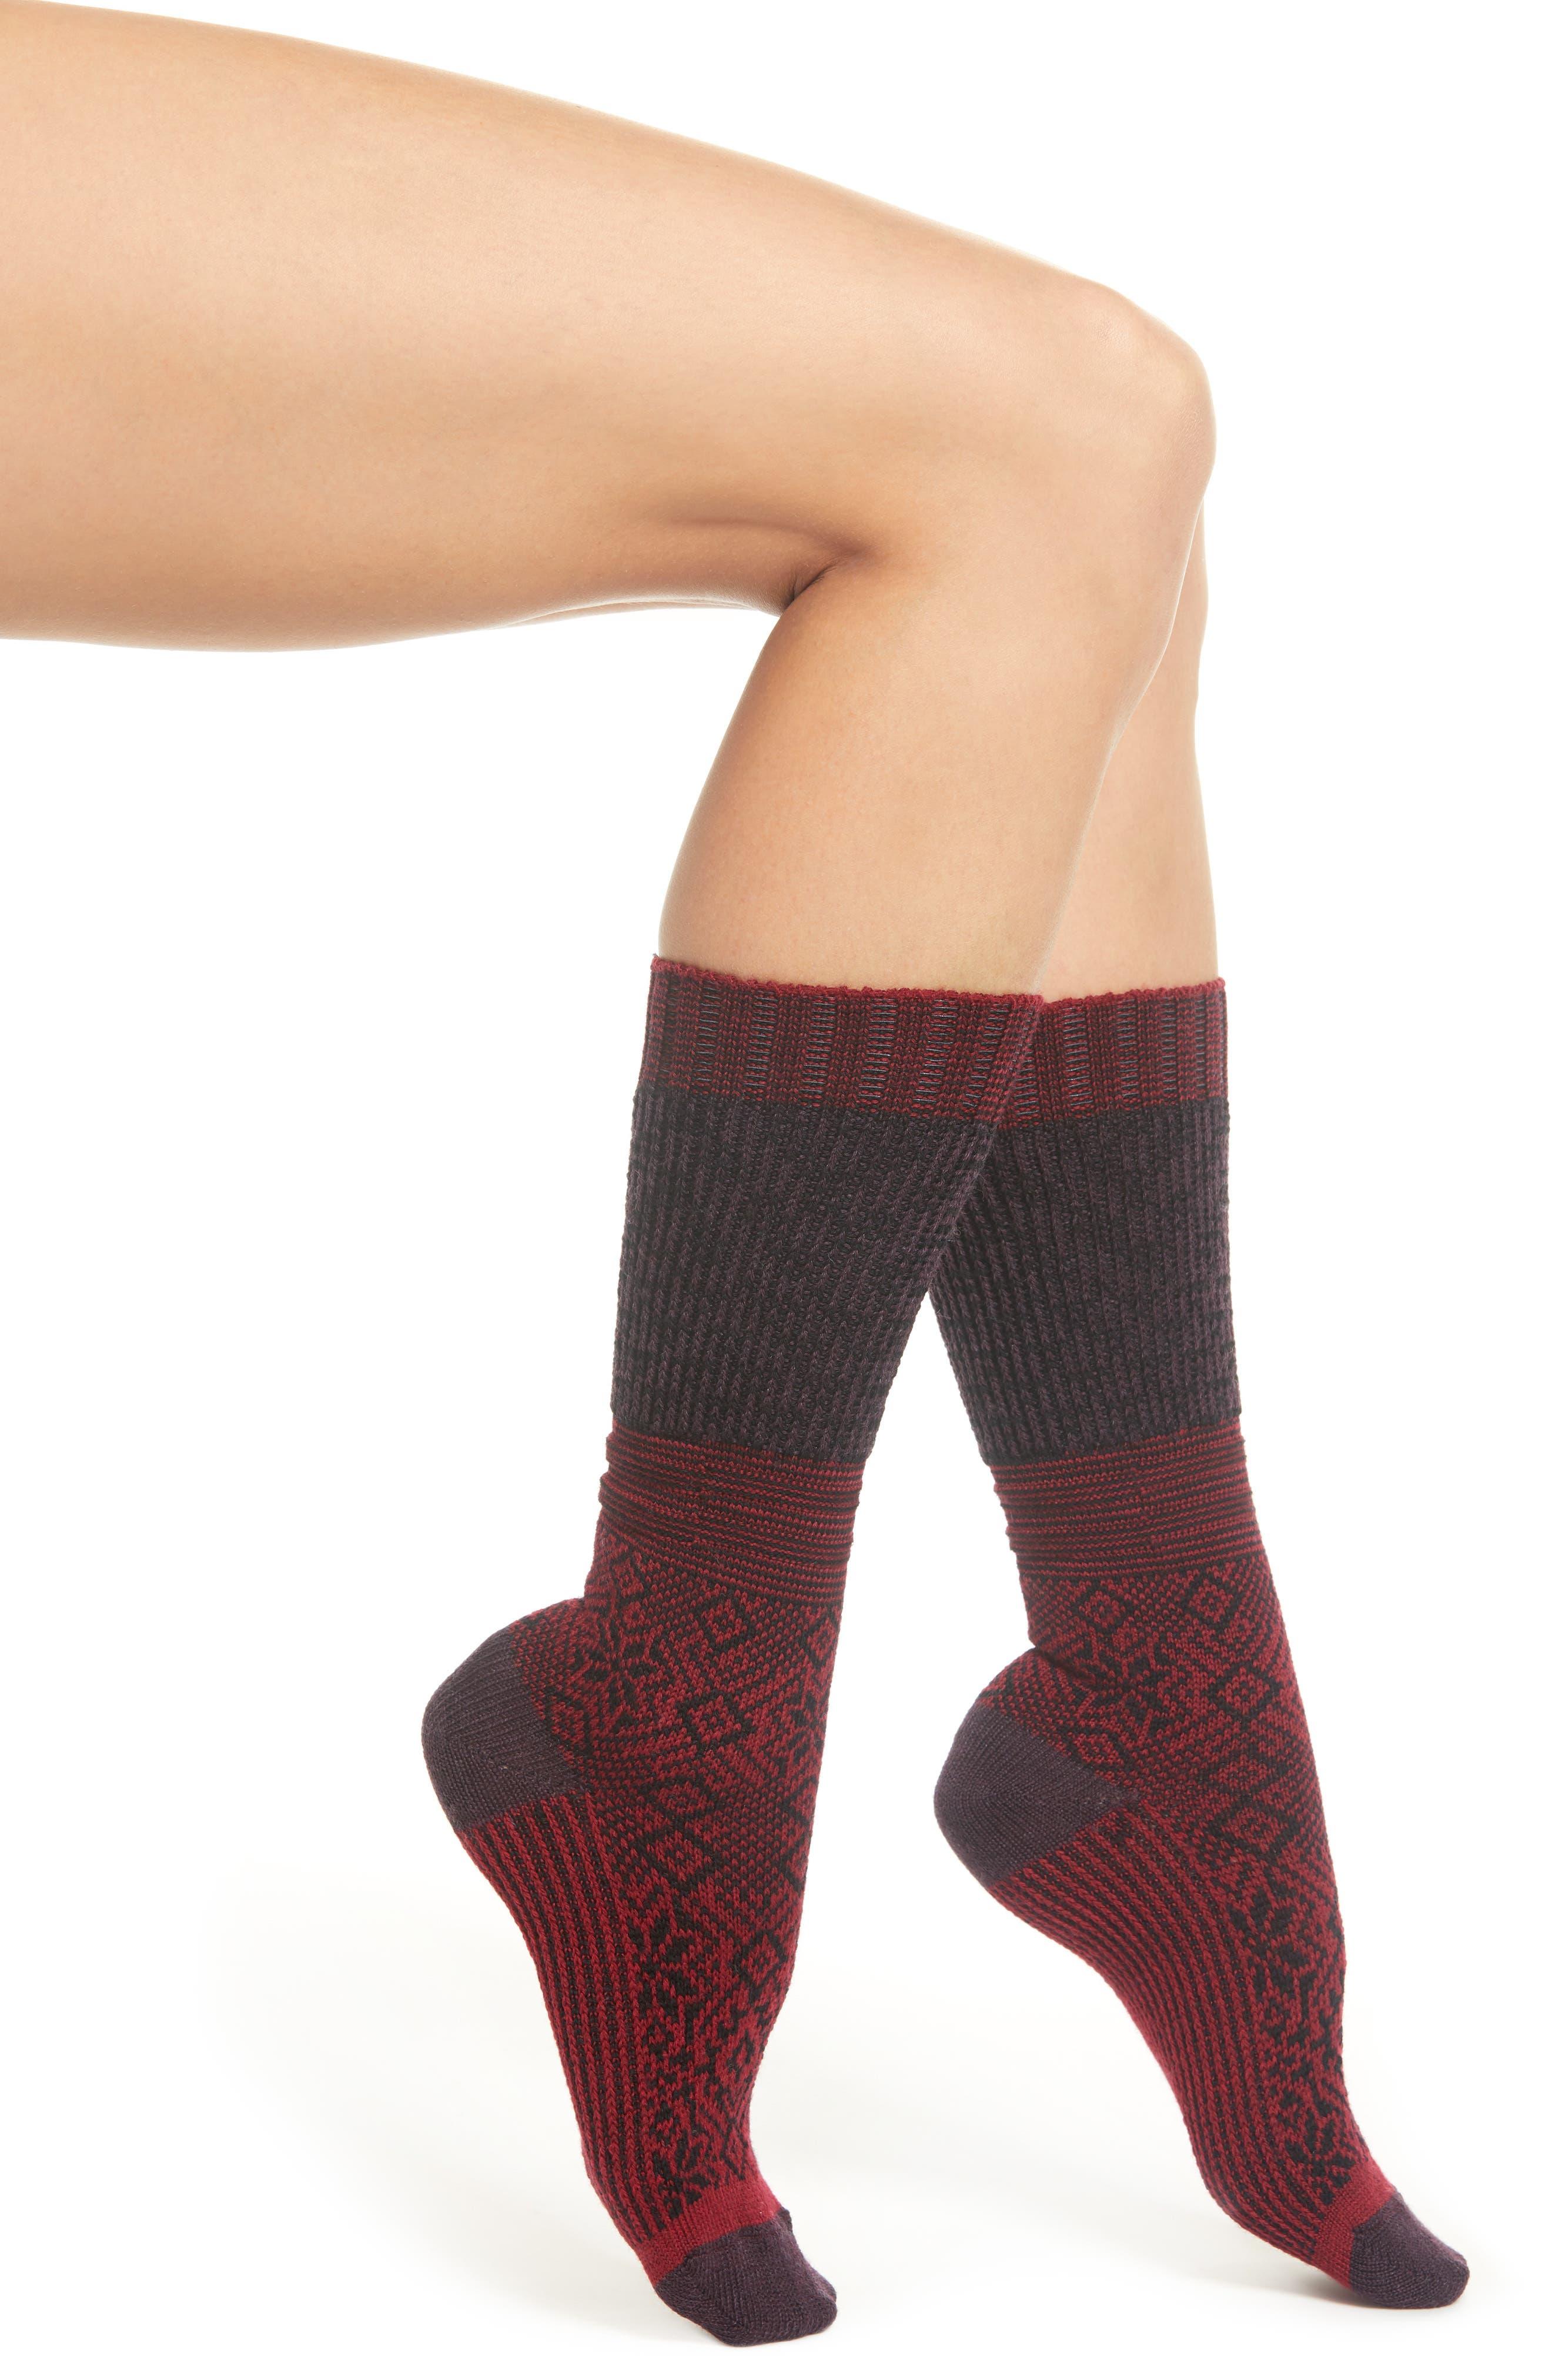 Snowflake Flurry Merino Wool Blend Socks,                             Main thumbnail 1, color,                             TIBETAN RED HEATHER